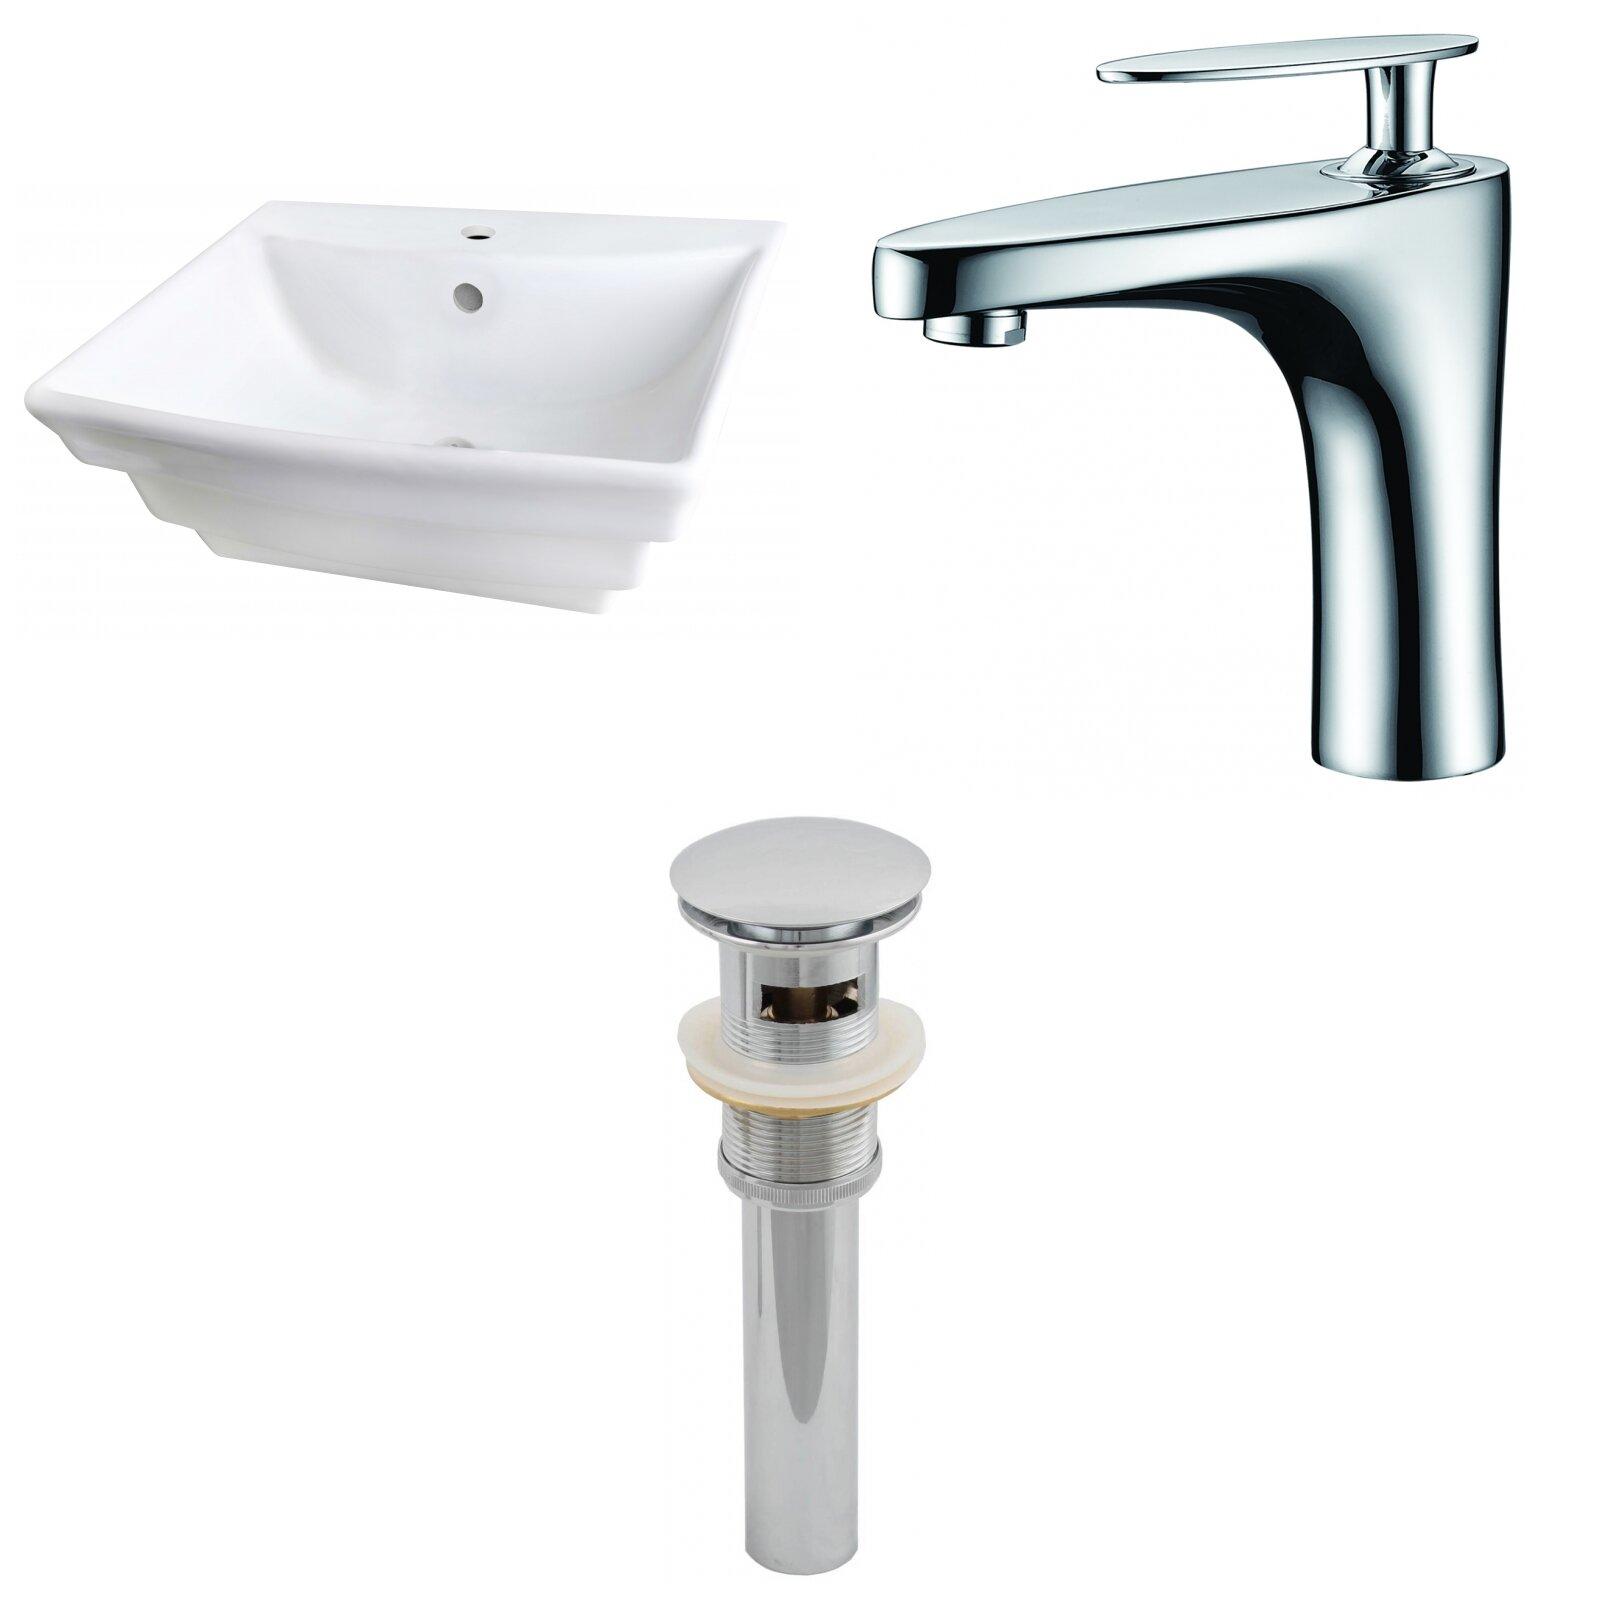 Avanities Ceramic 20 Wall Mount Bathroom Sink With Faucet And Overflow Wayfair